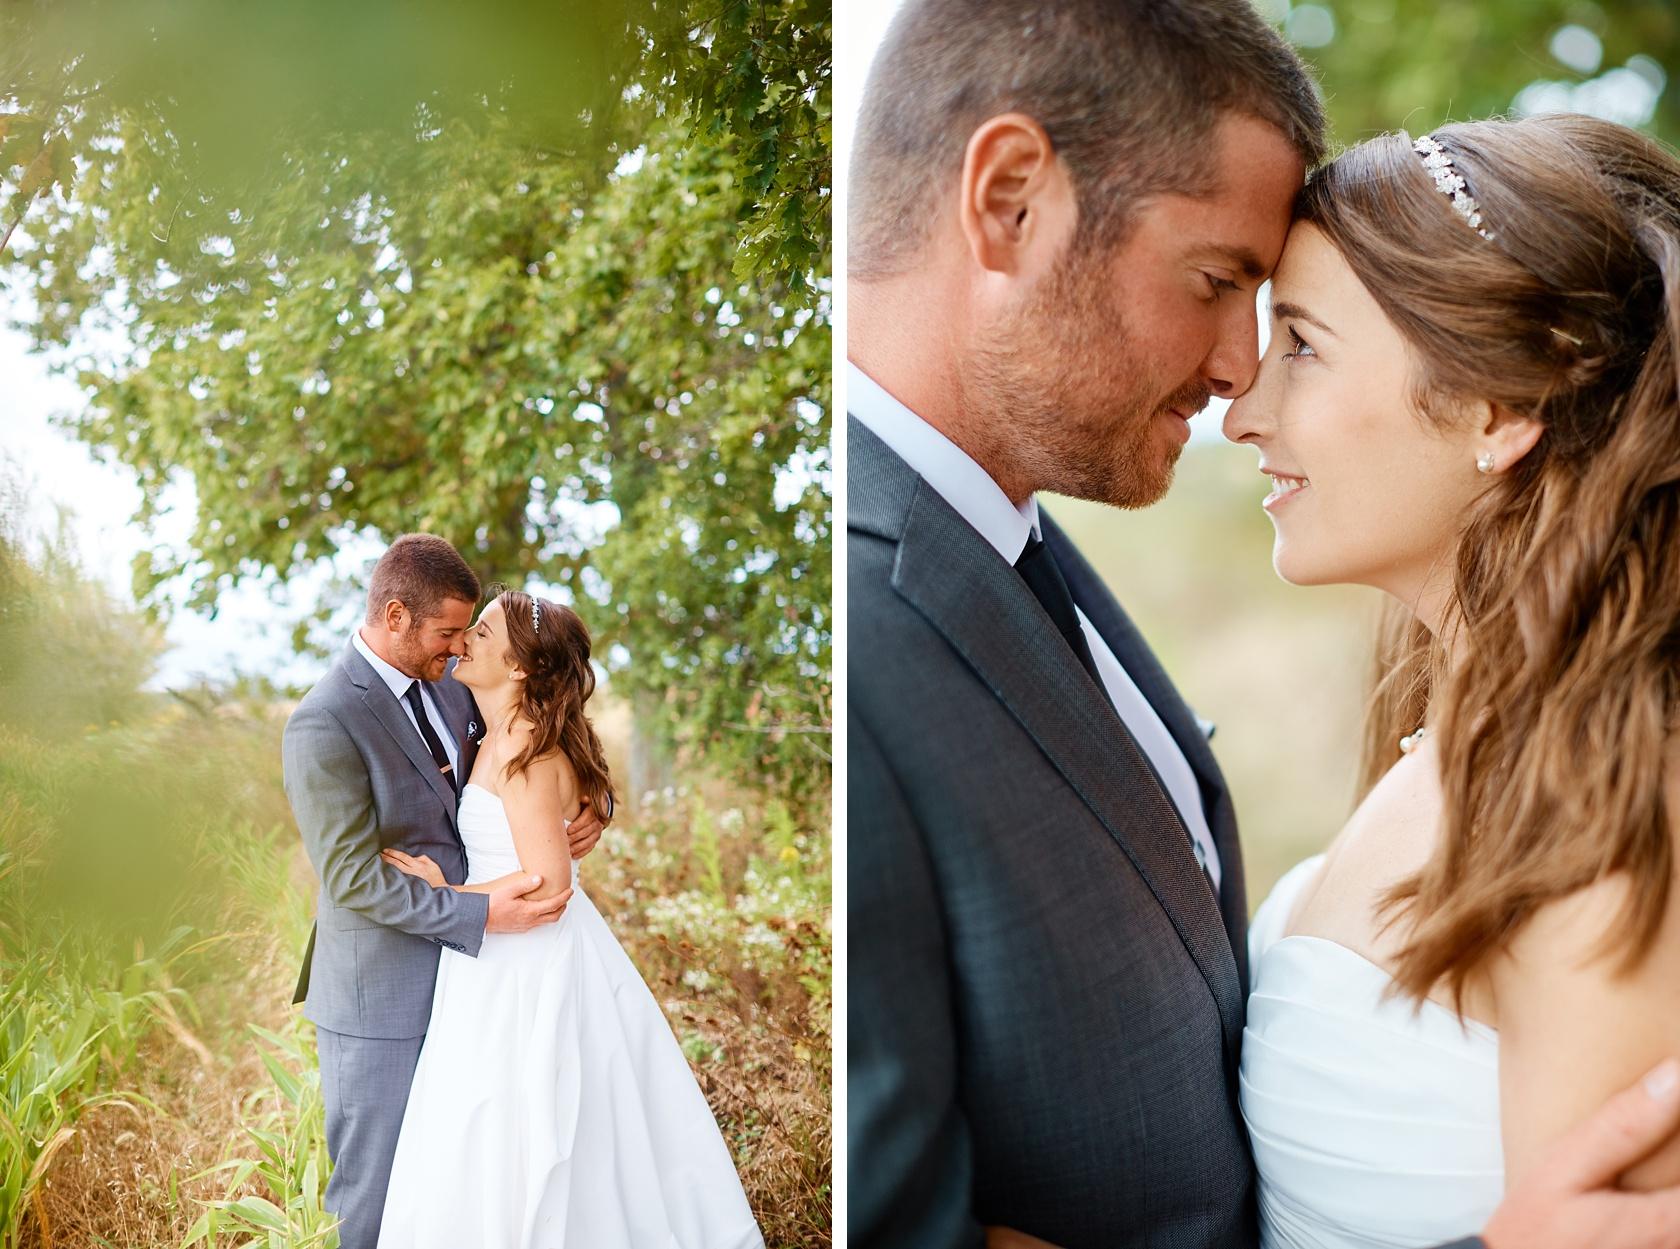 000011-farm-wedding-stephen-sager-photography